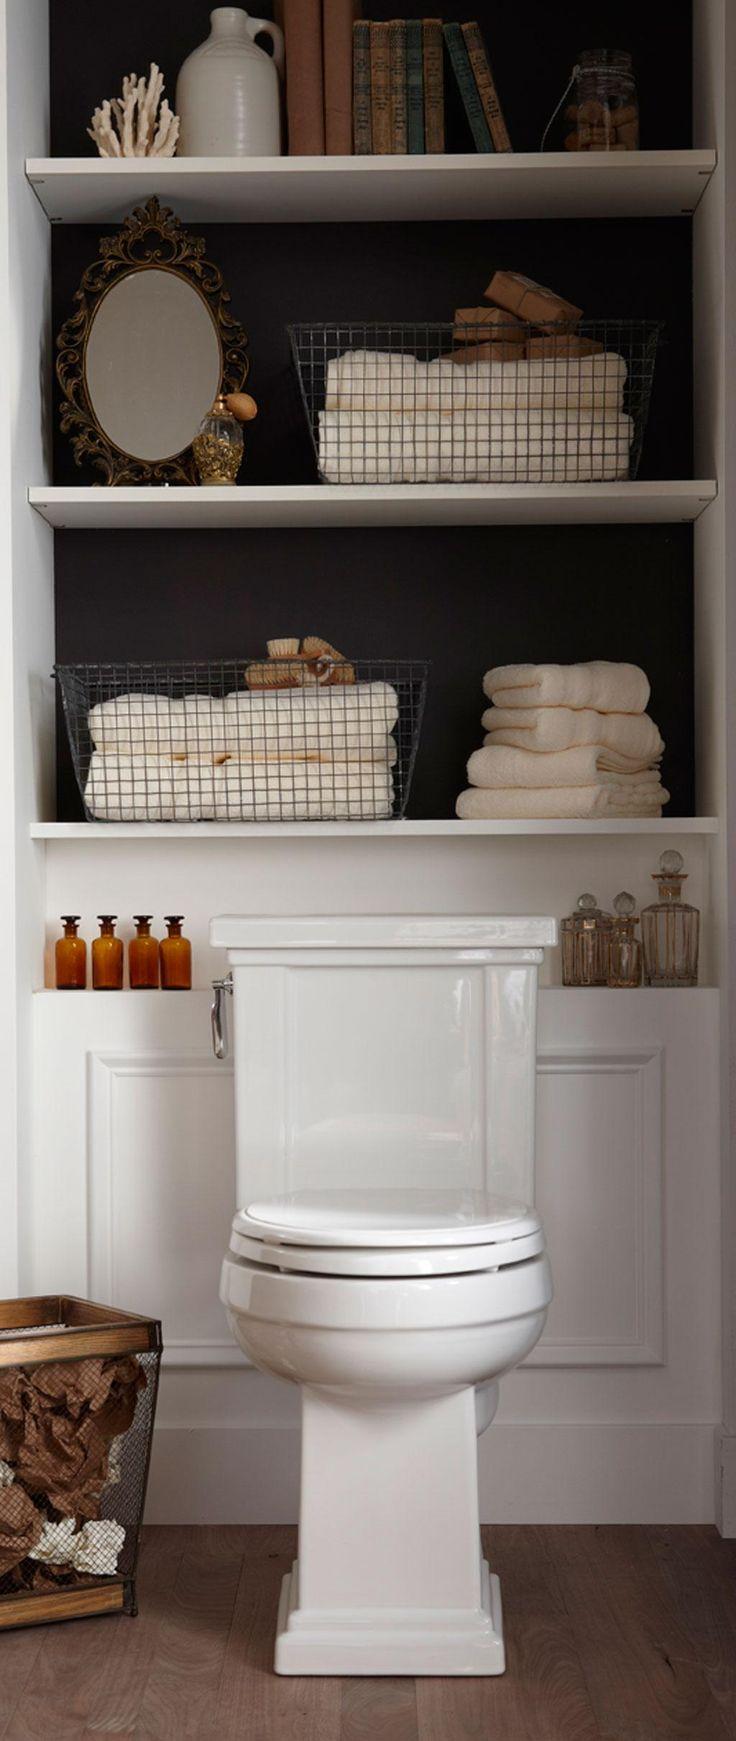 bathroom over toilet shelves | My Web Value